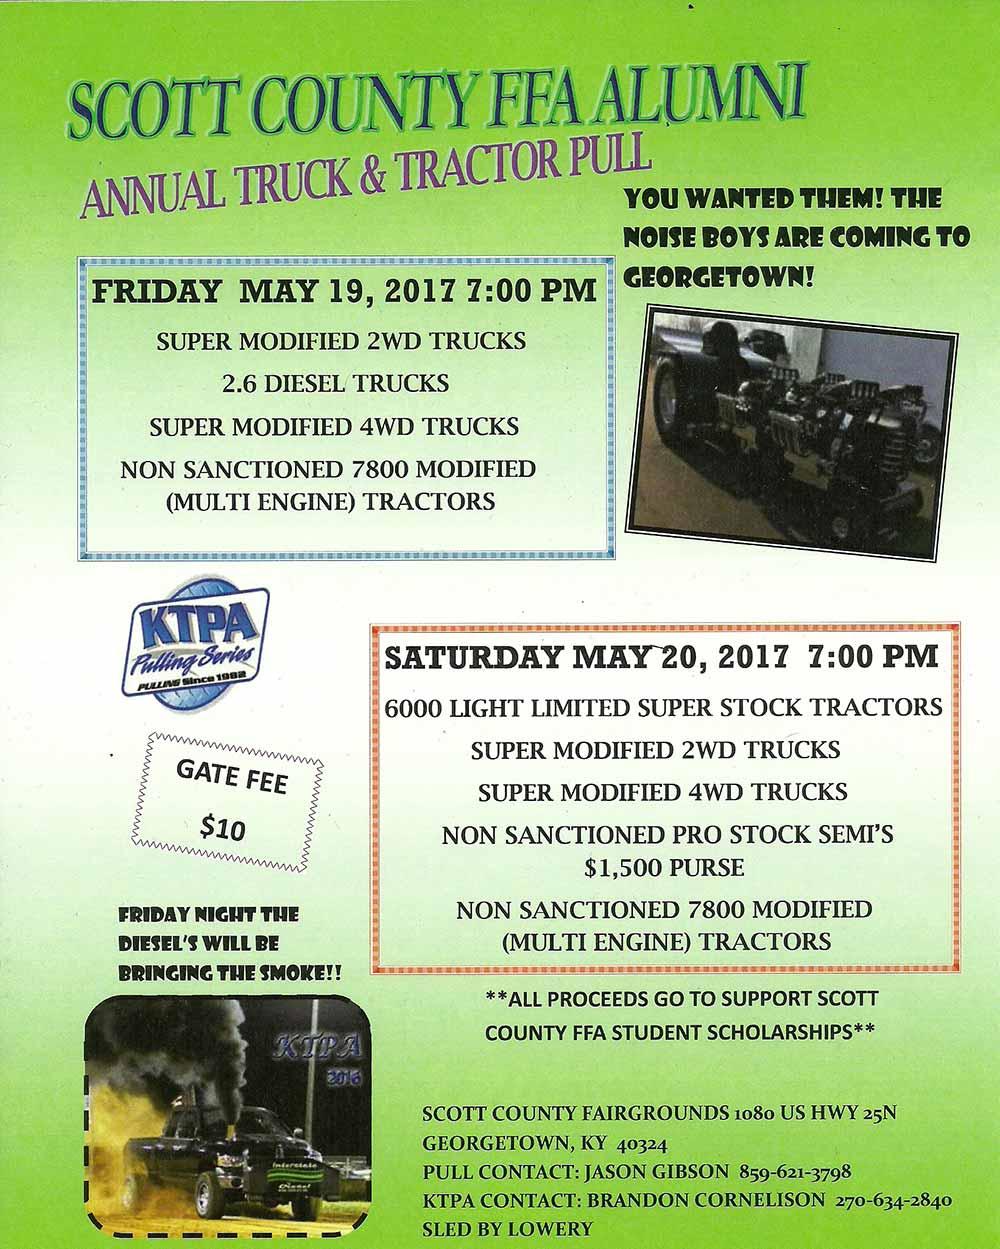 Scott County FFA Alumni Truck and Tractor Pull